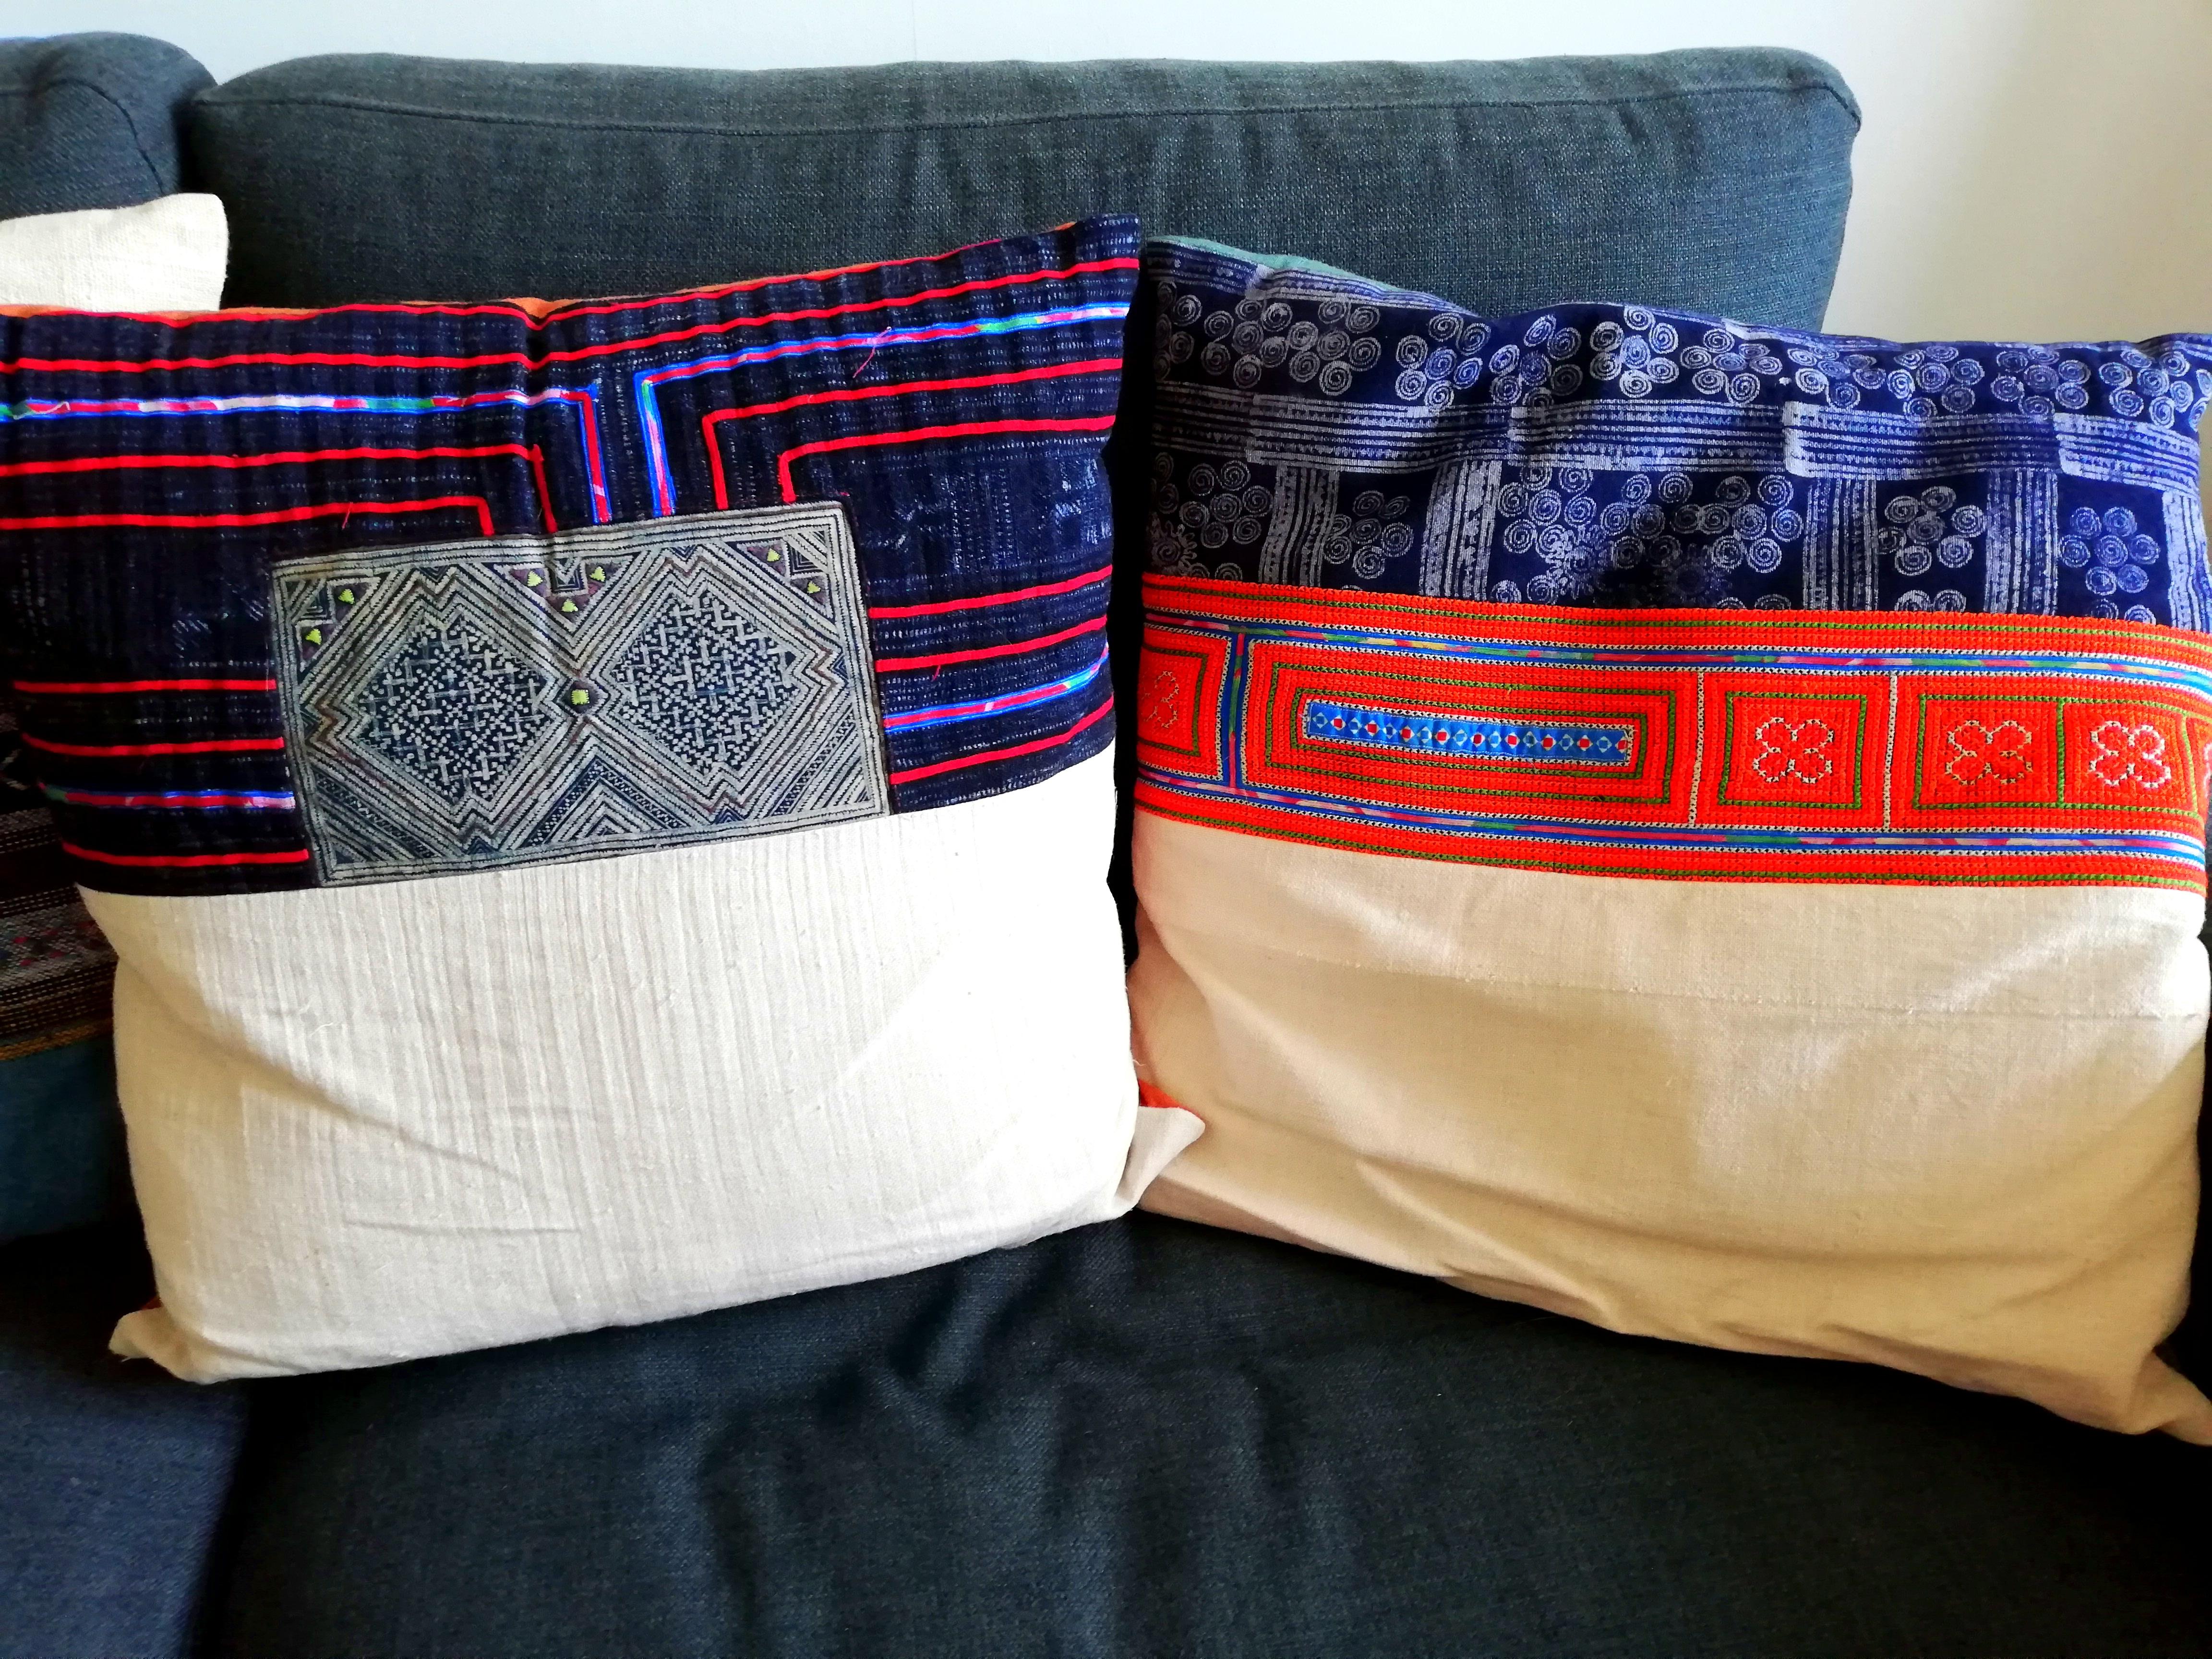 Coussins tissus indigo souvenirs du Vietnam.